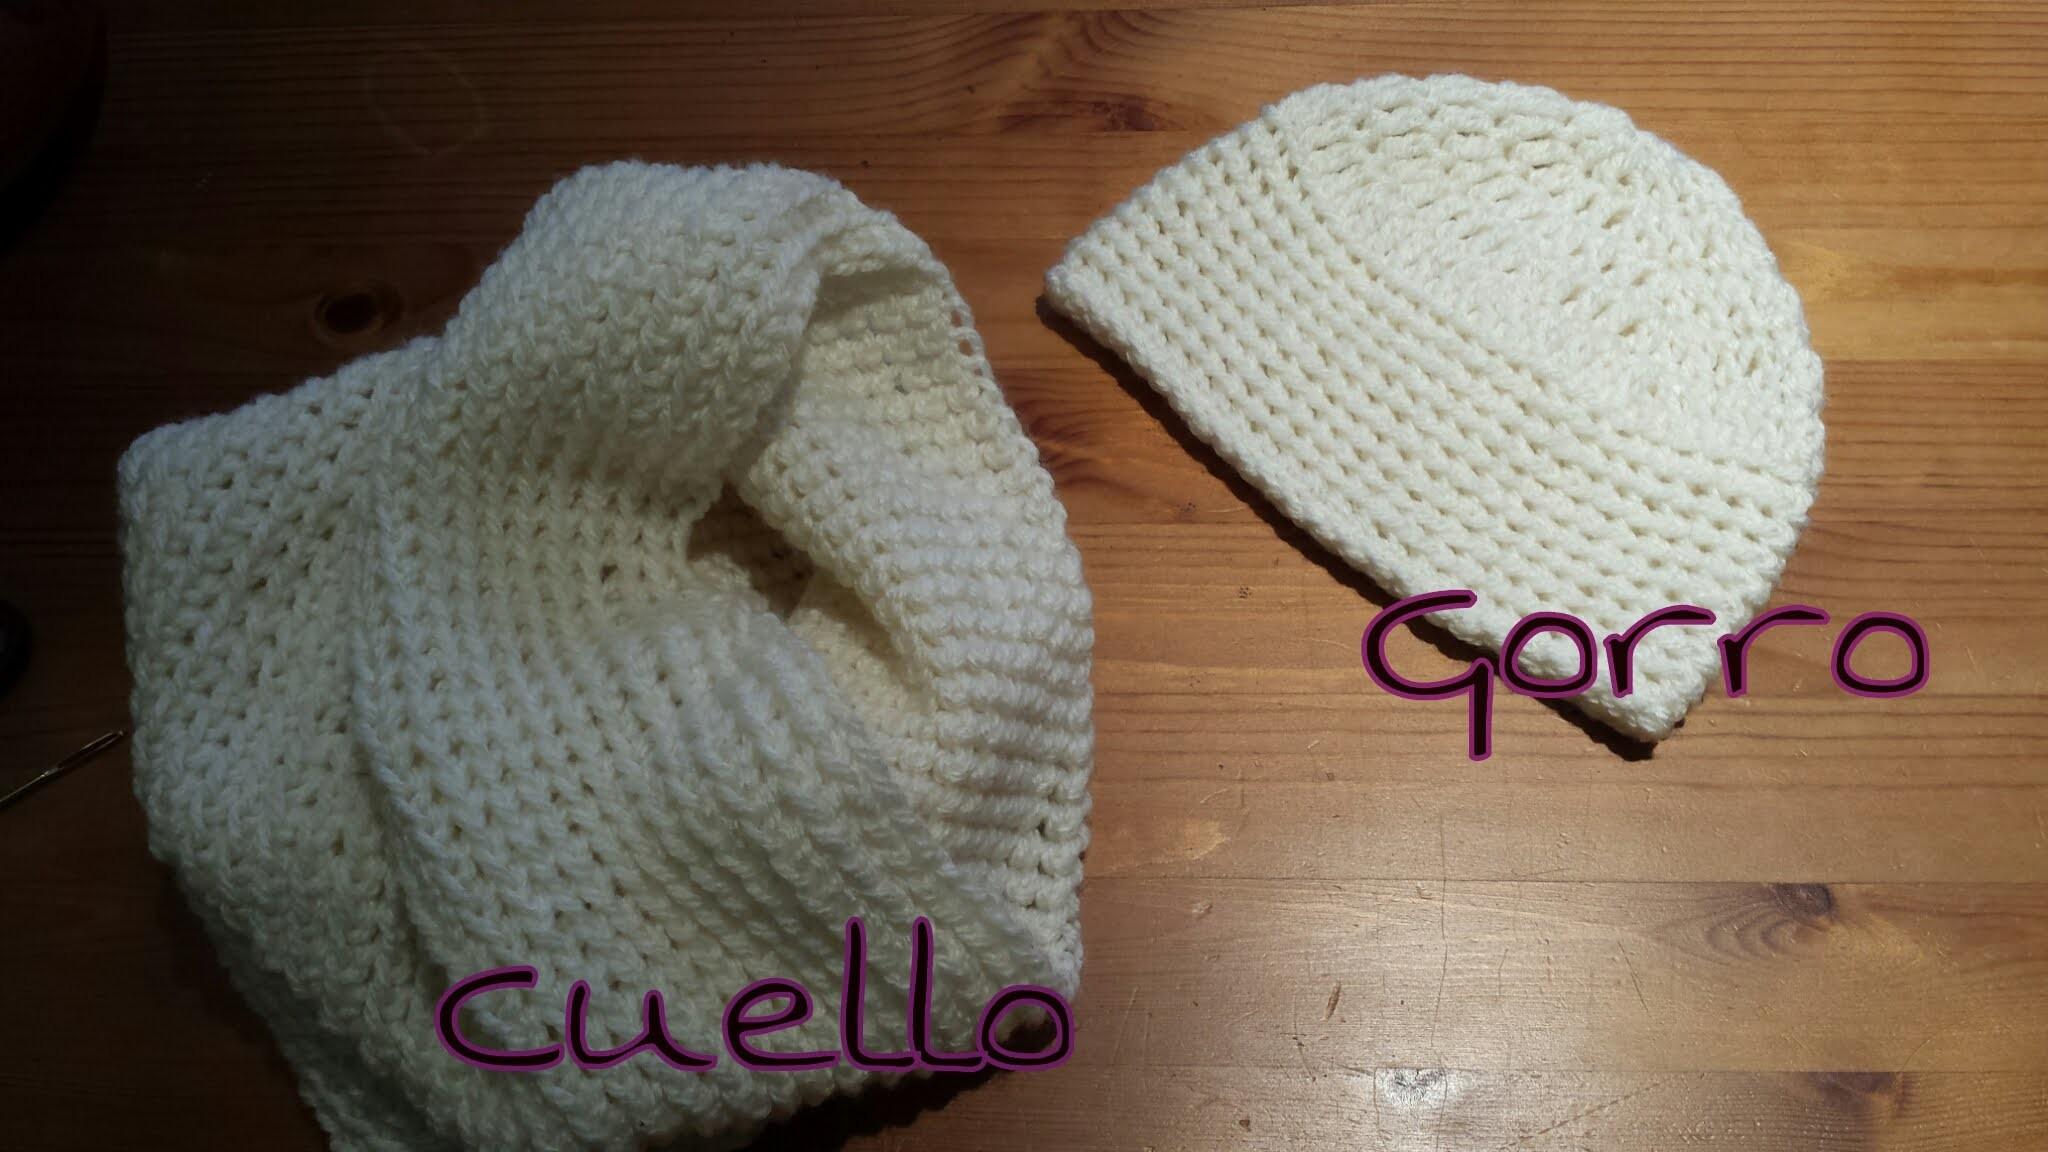 Cuello de Tubo y Gorro a juego. Tube nek Unisex hat game.(English Subtitles)